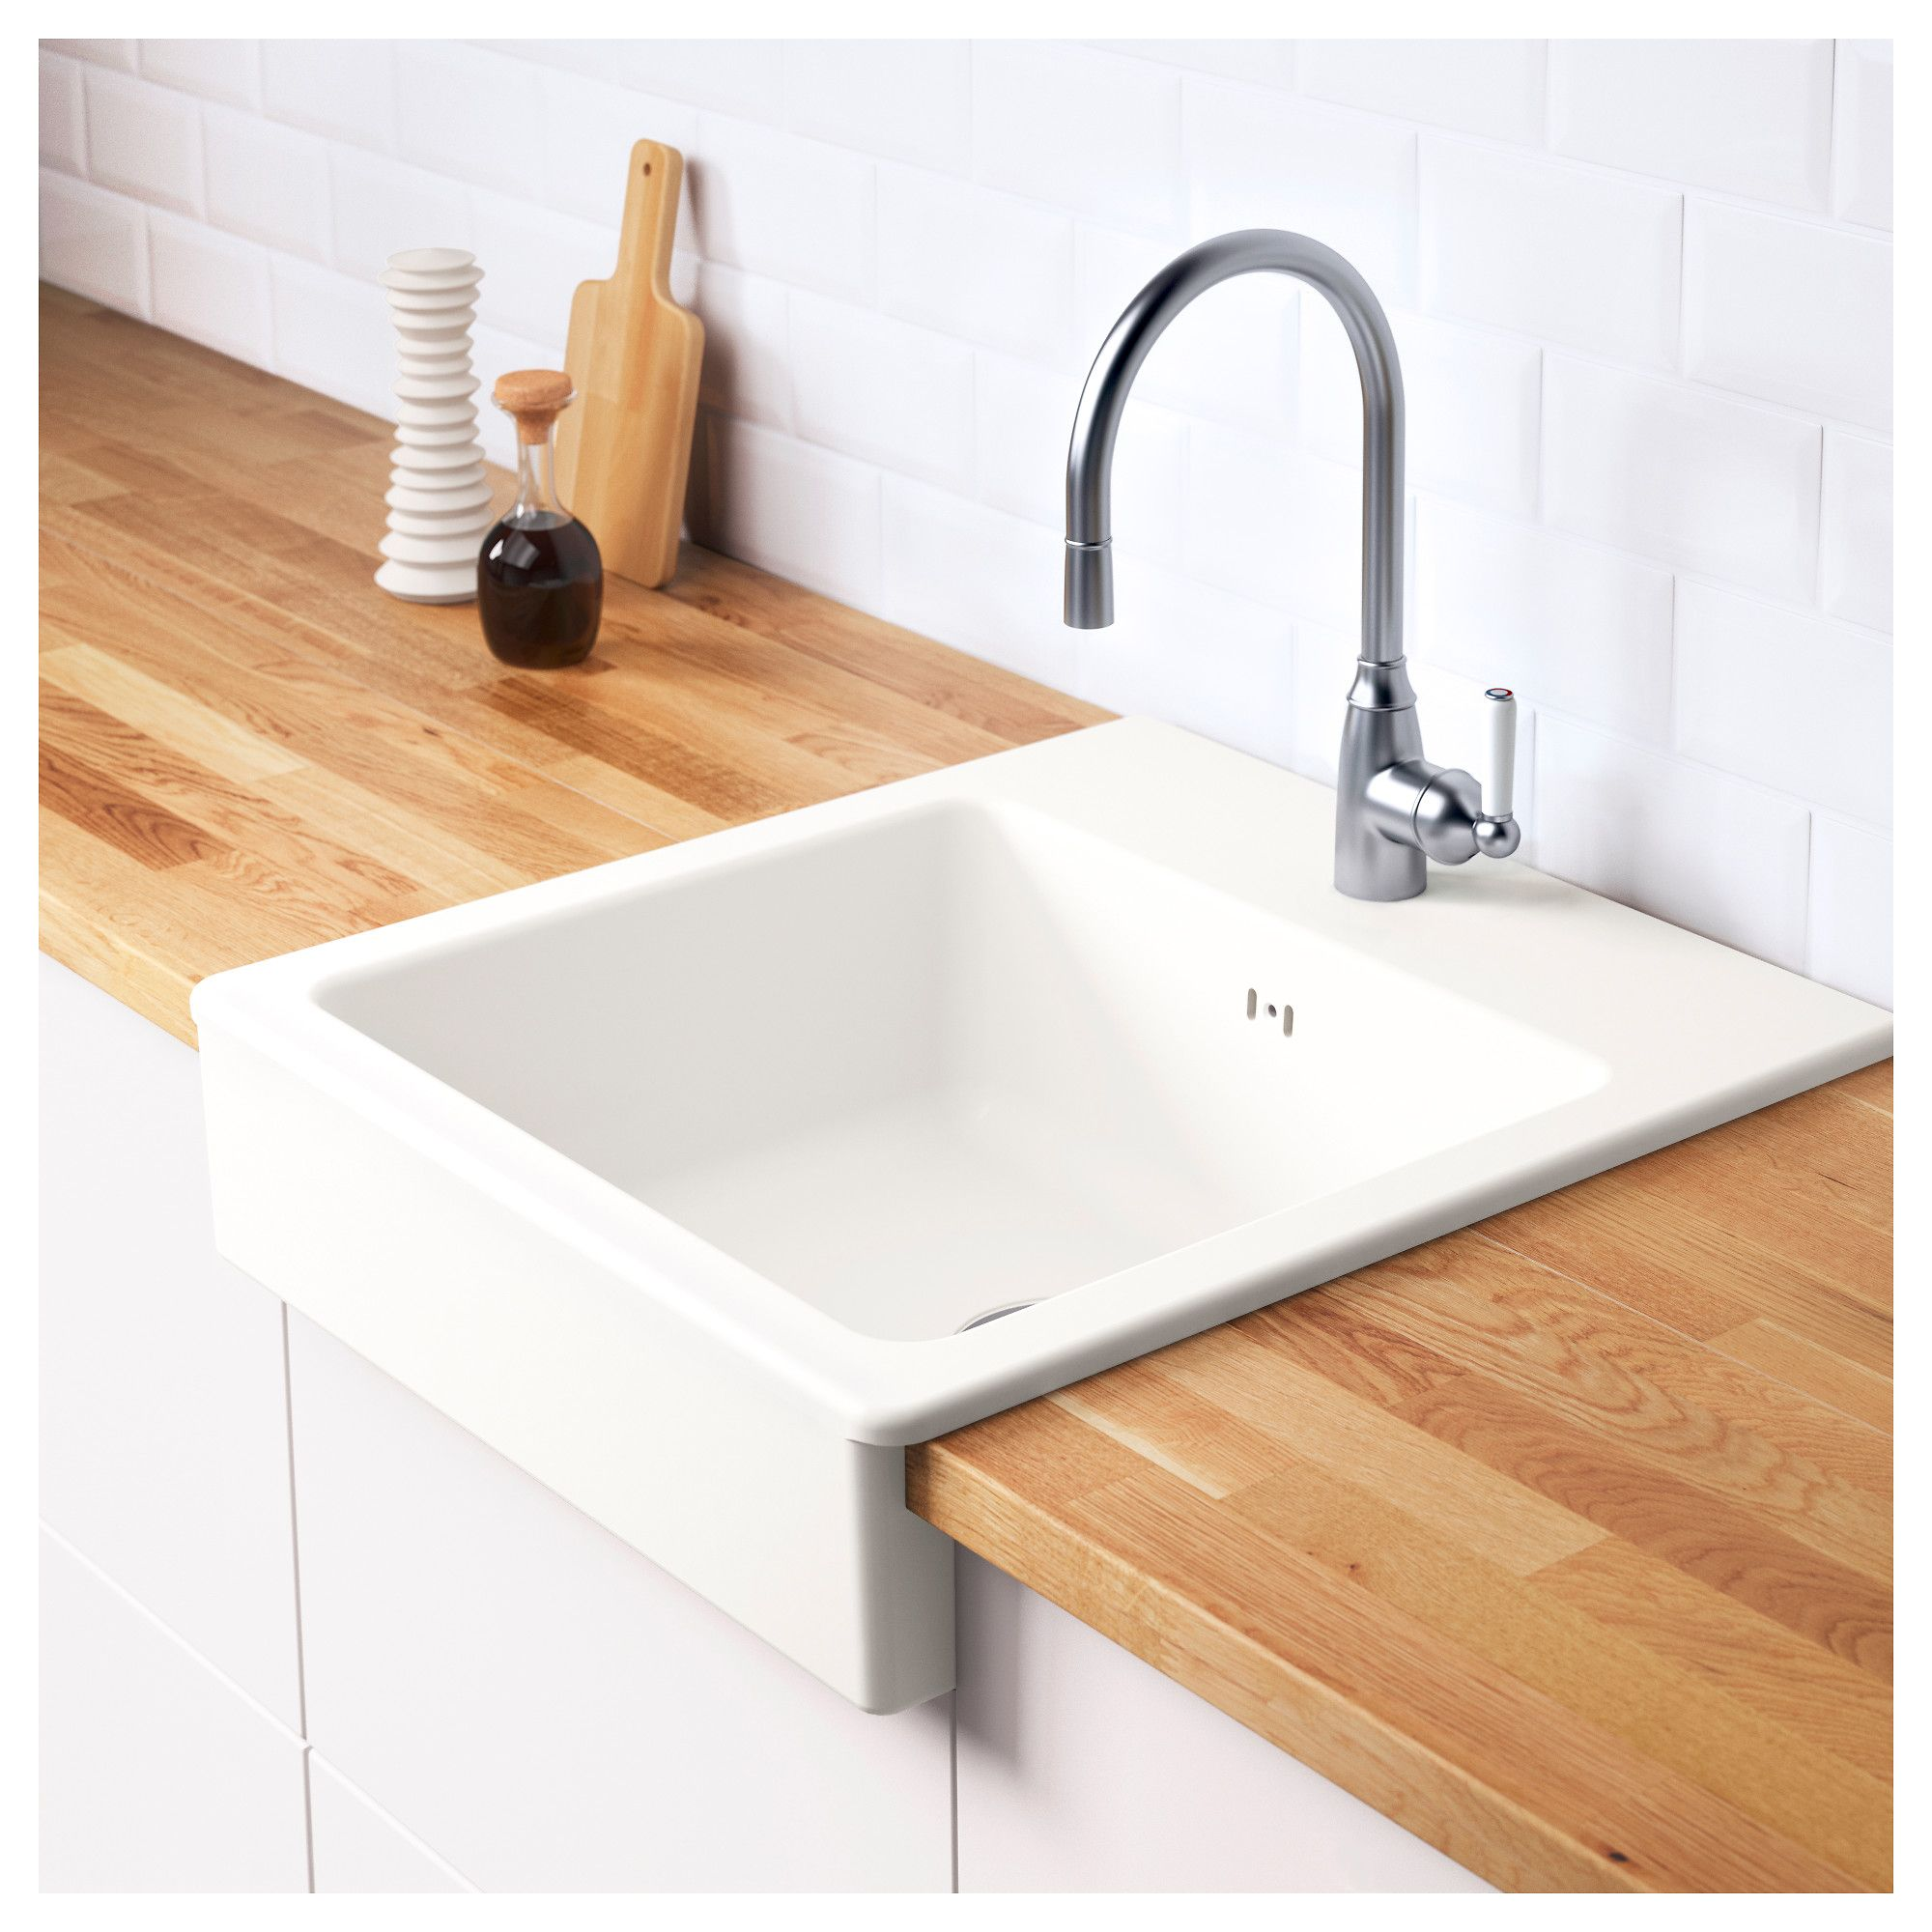 domsj繝笆 onset sink 1 bowl white 62x66 cm sinks bowls and